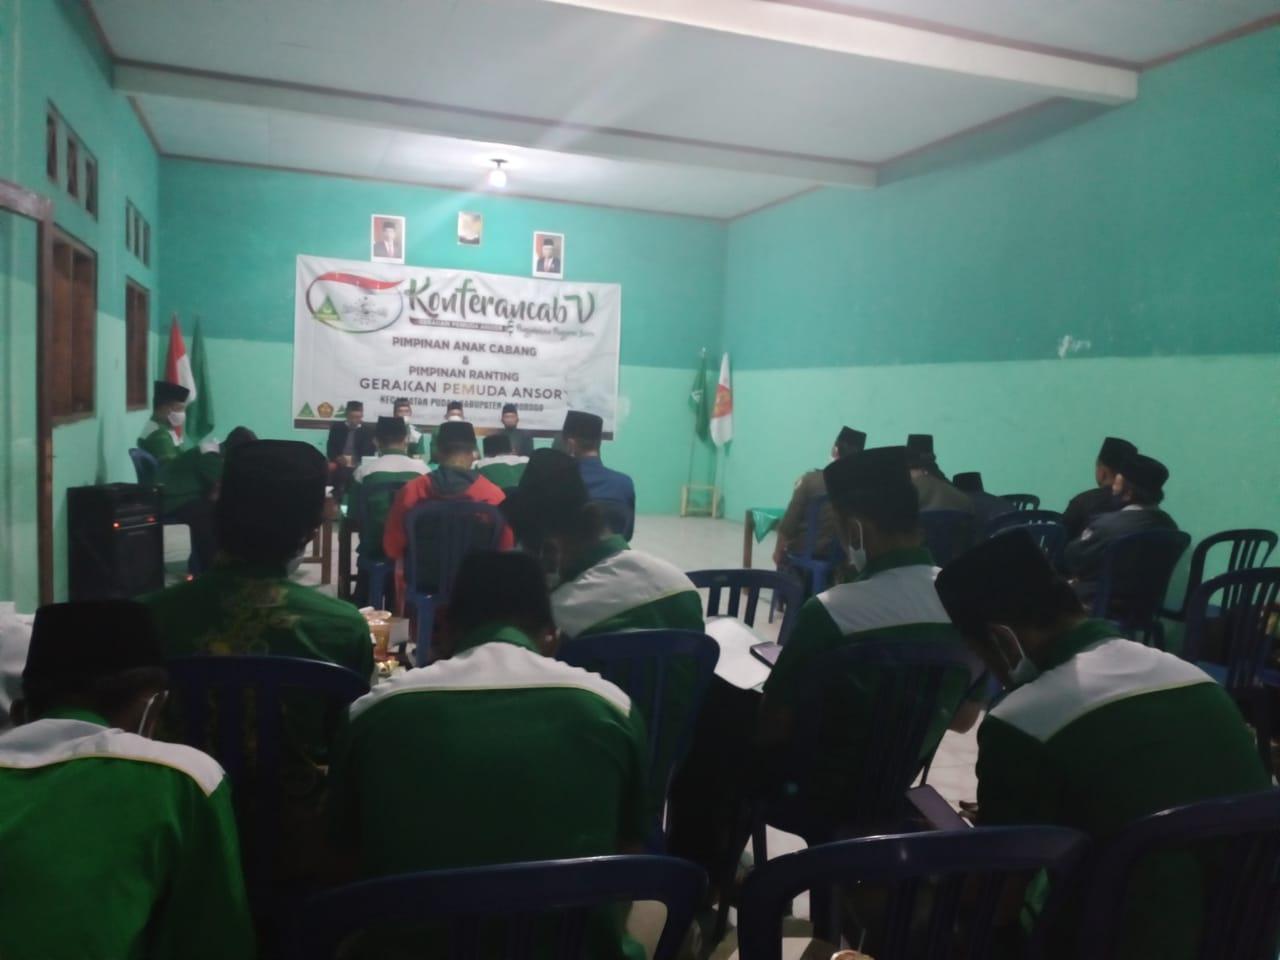 Penegasan Peraturan Organisasi Peserta Konferancab GP Ansor Pudak serius mengikuti sidang pleno